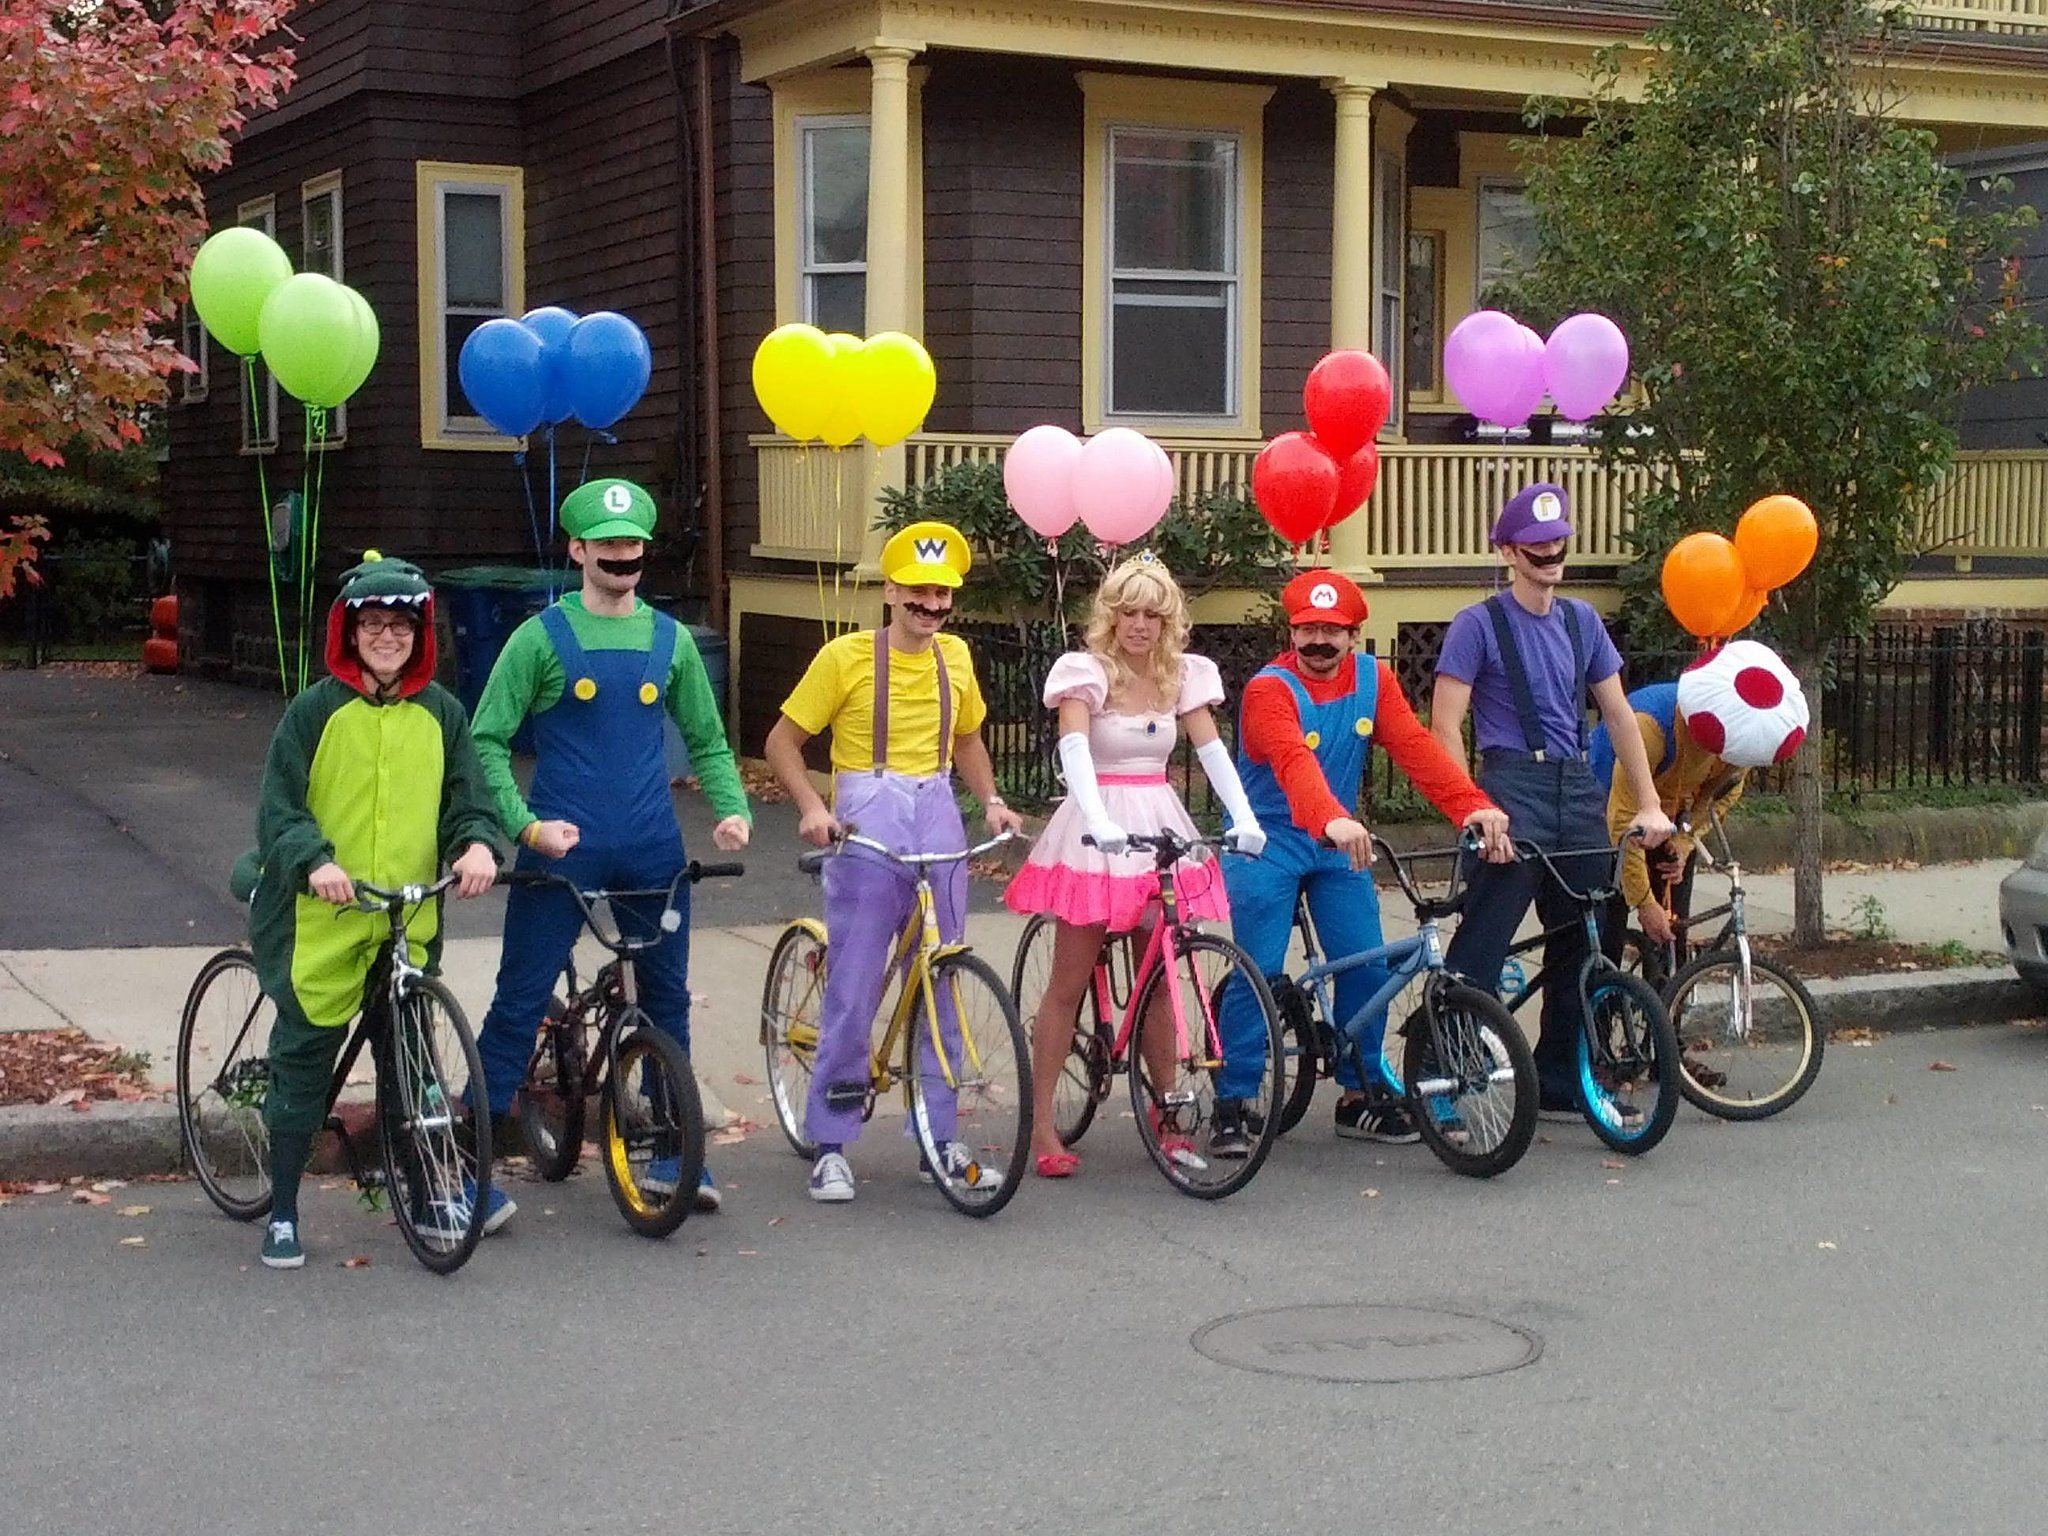 Dominoes Group Halloween Costumes Diy Group Halloween Costumes